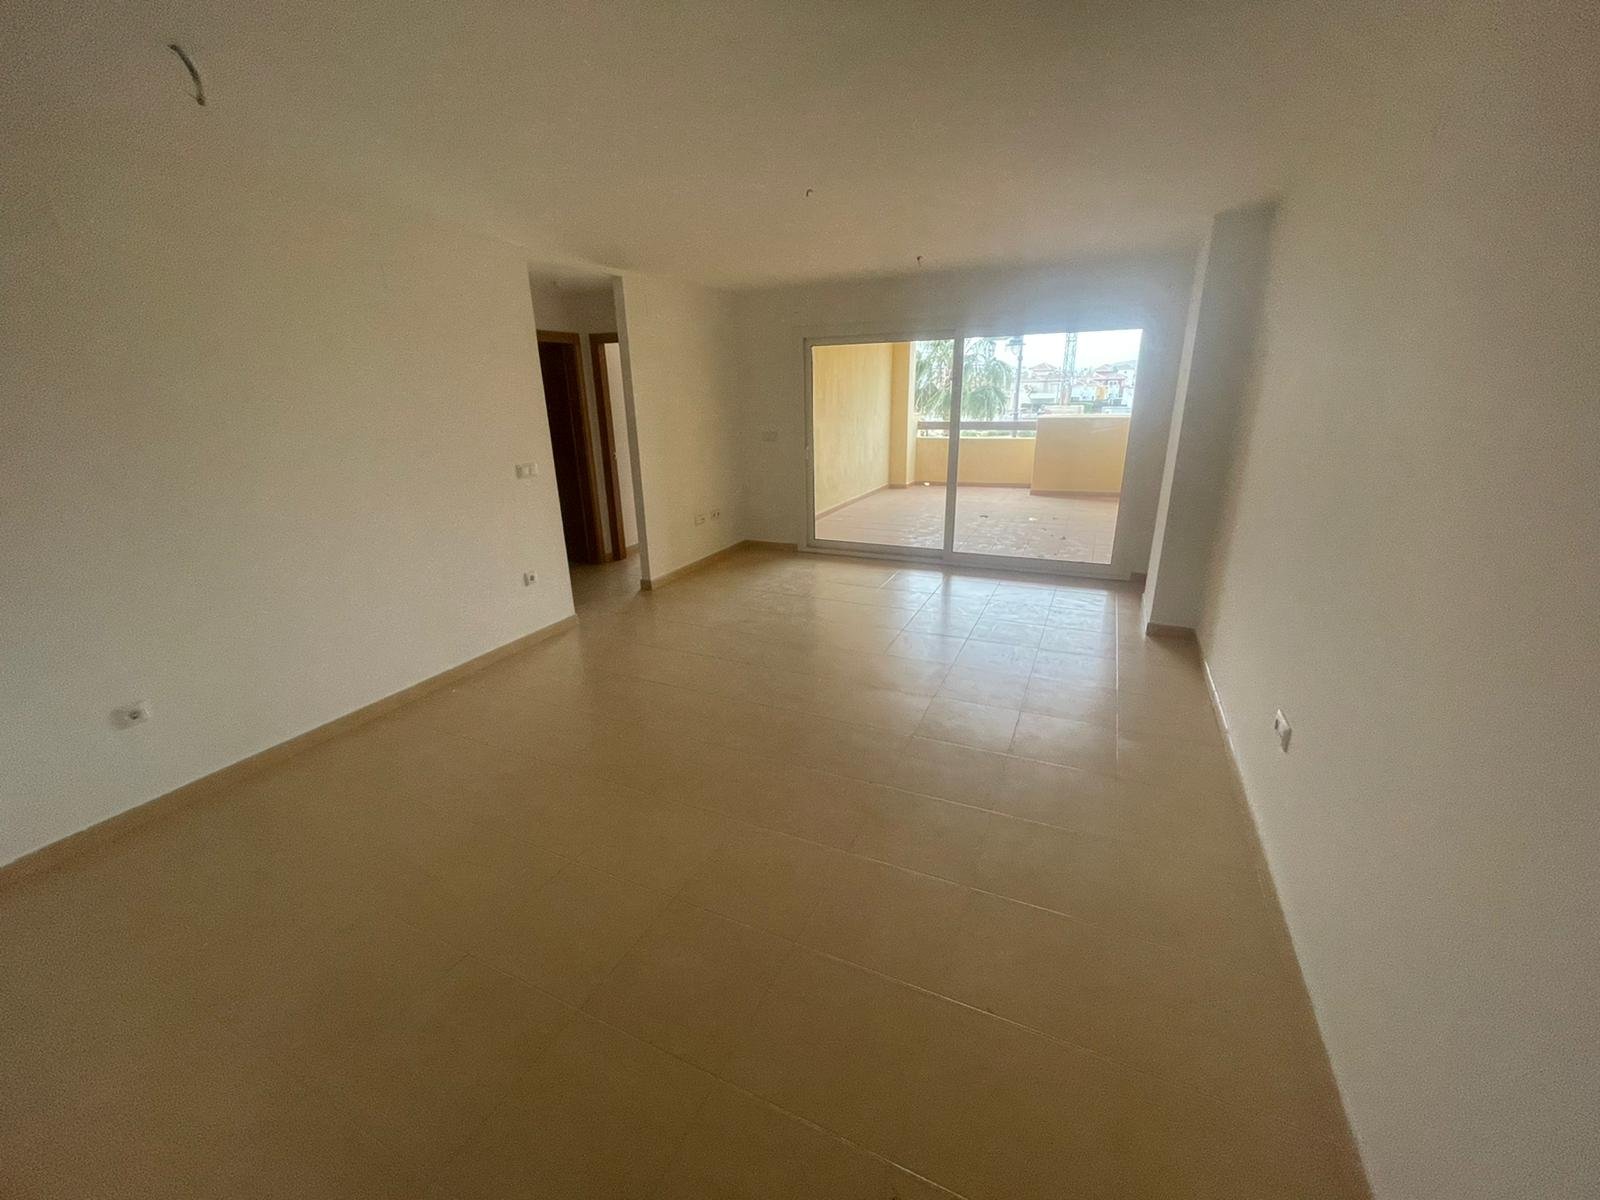 Maravilloso apartamento en Residencial Bulevard